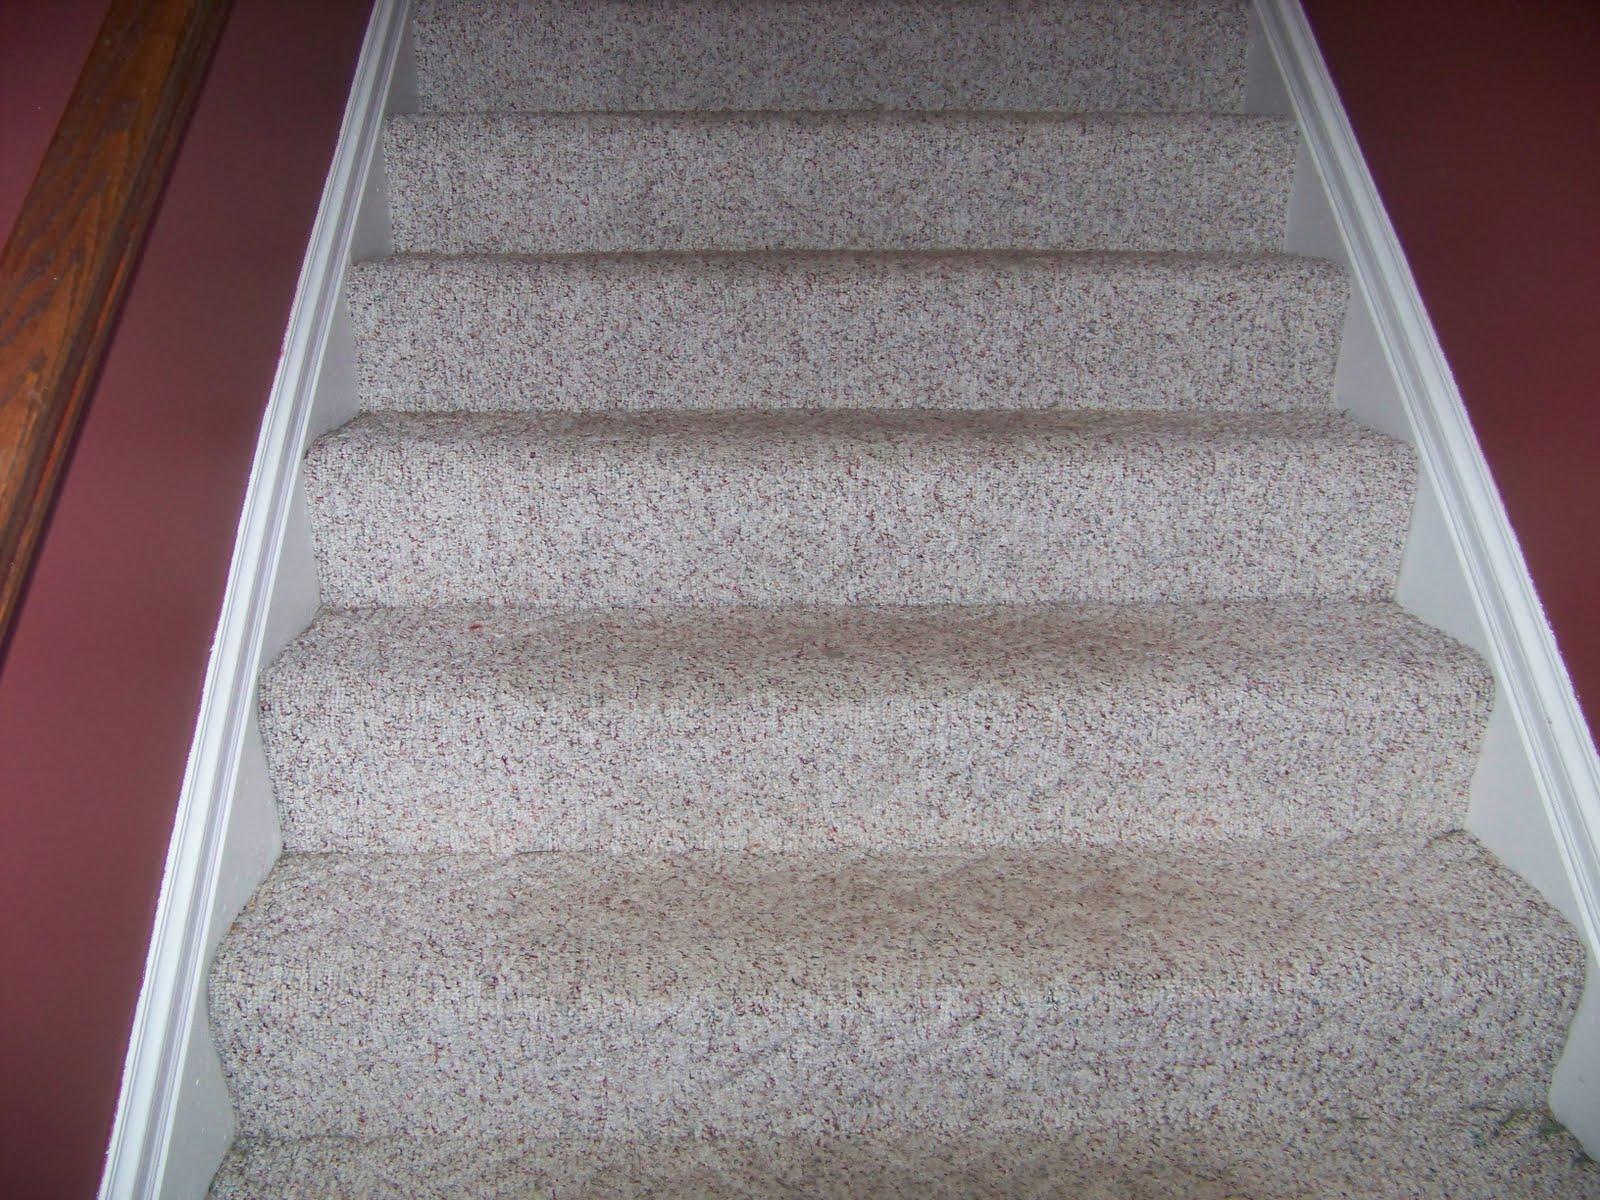 Berber Carpet On Stairs